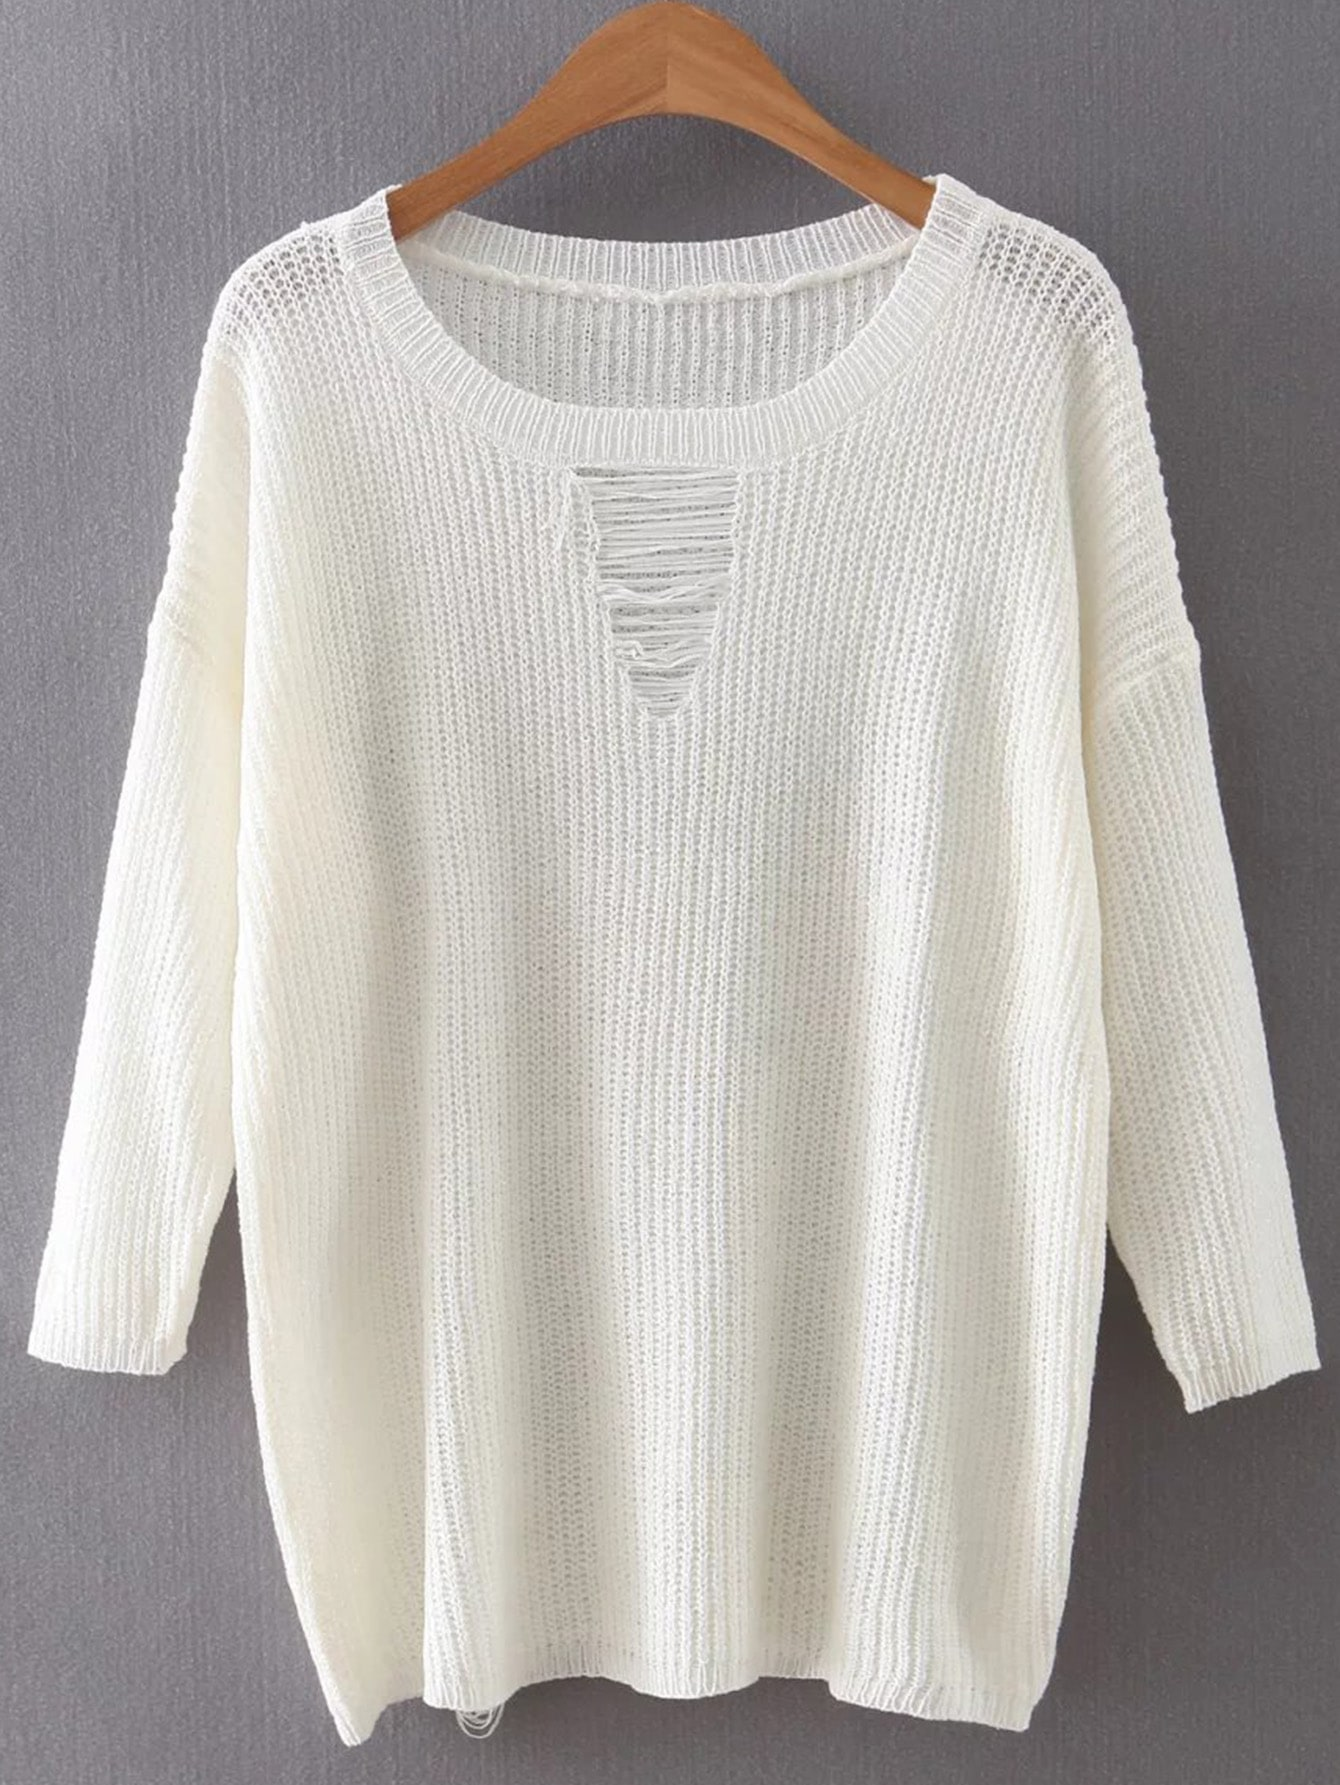 sweater160727202_2